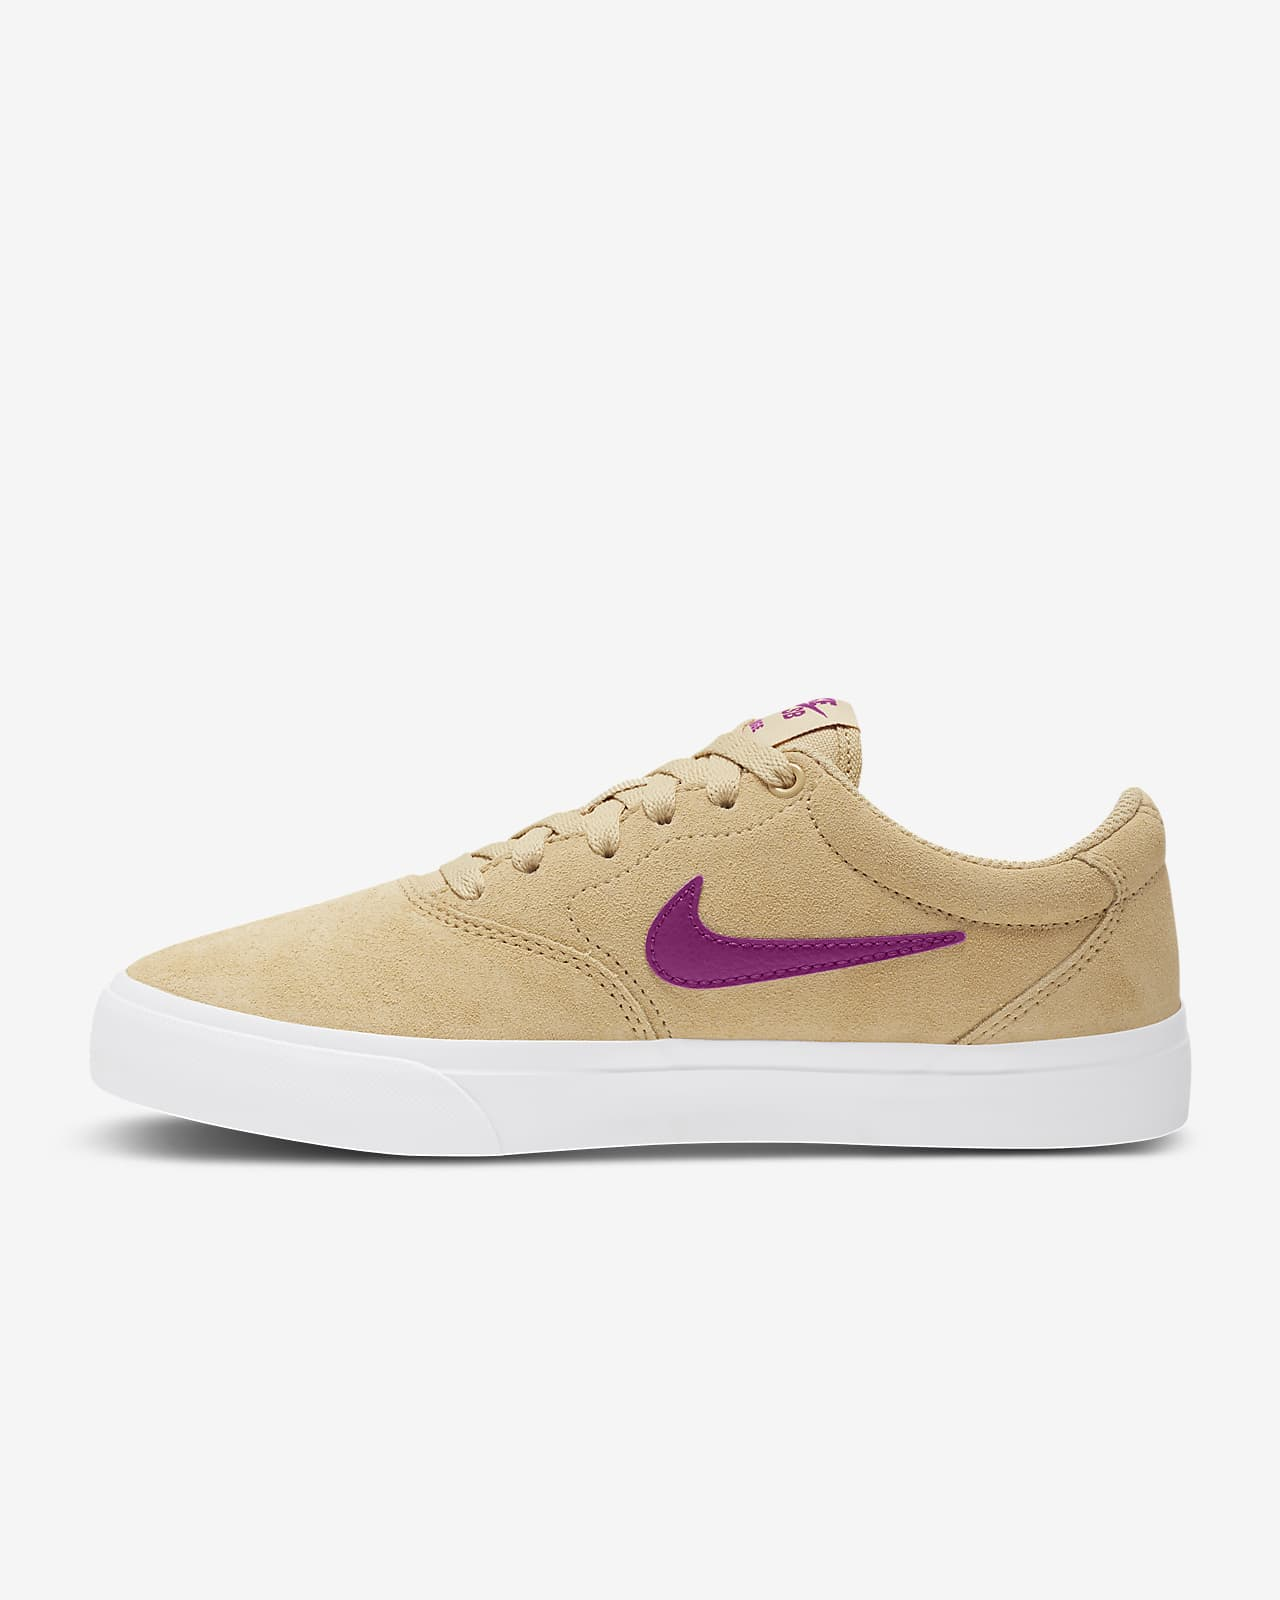 Nike SB Charge Suede Women's Skate Shoe